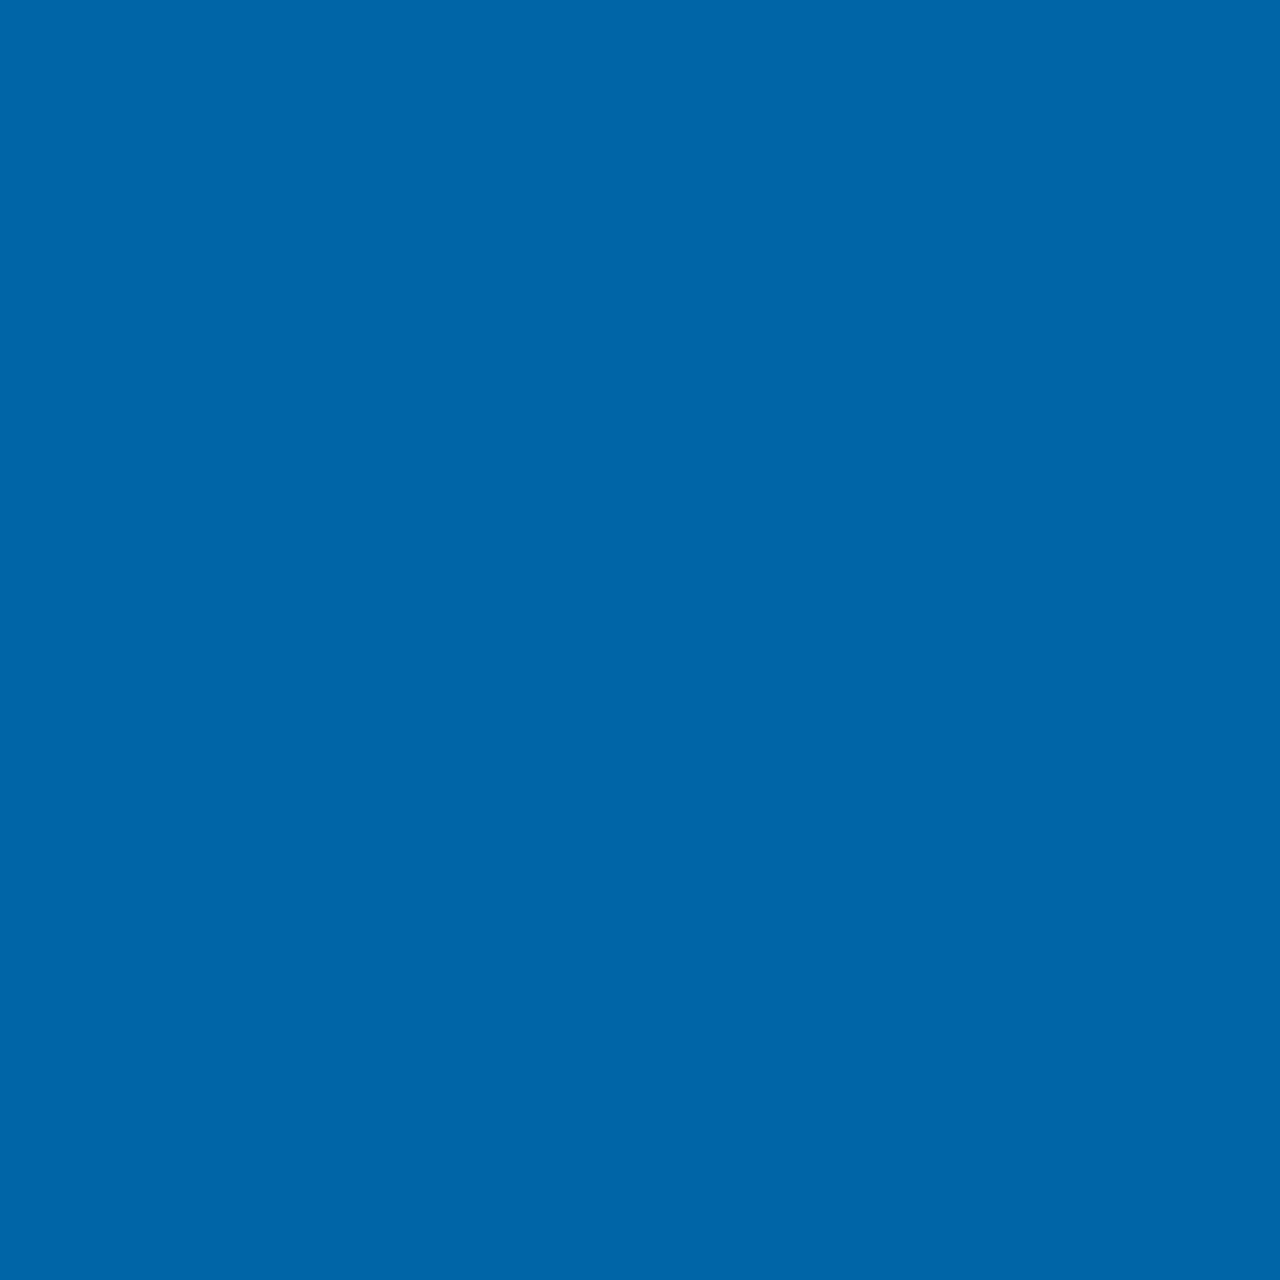 "#0079 Rosco Gels Roscolux Bright Blue, 20x24"""